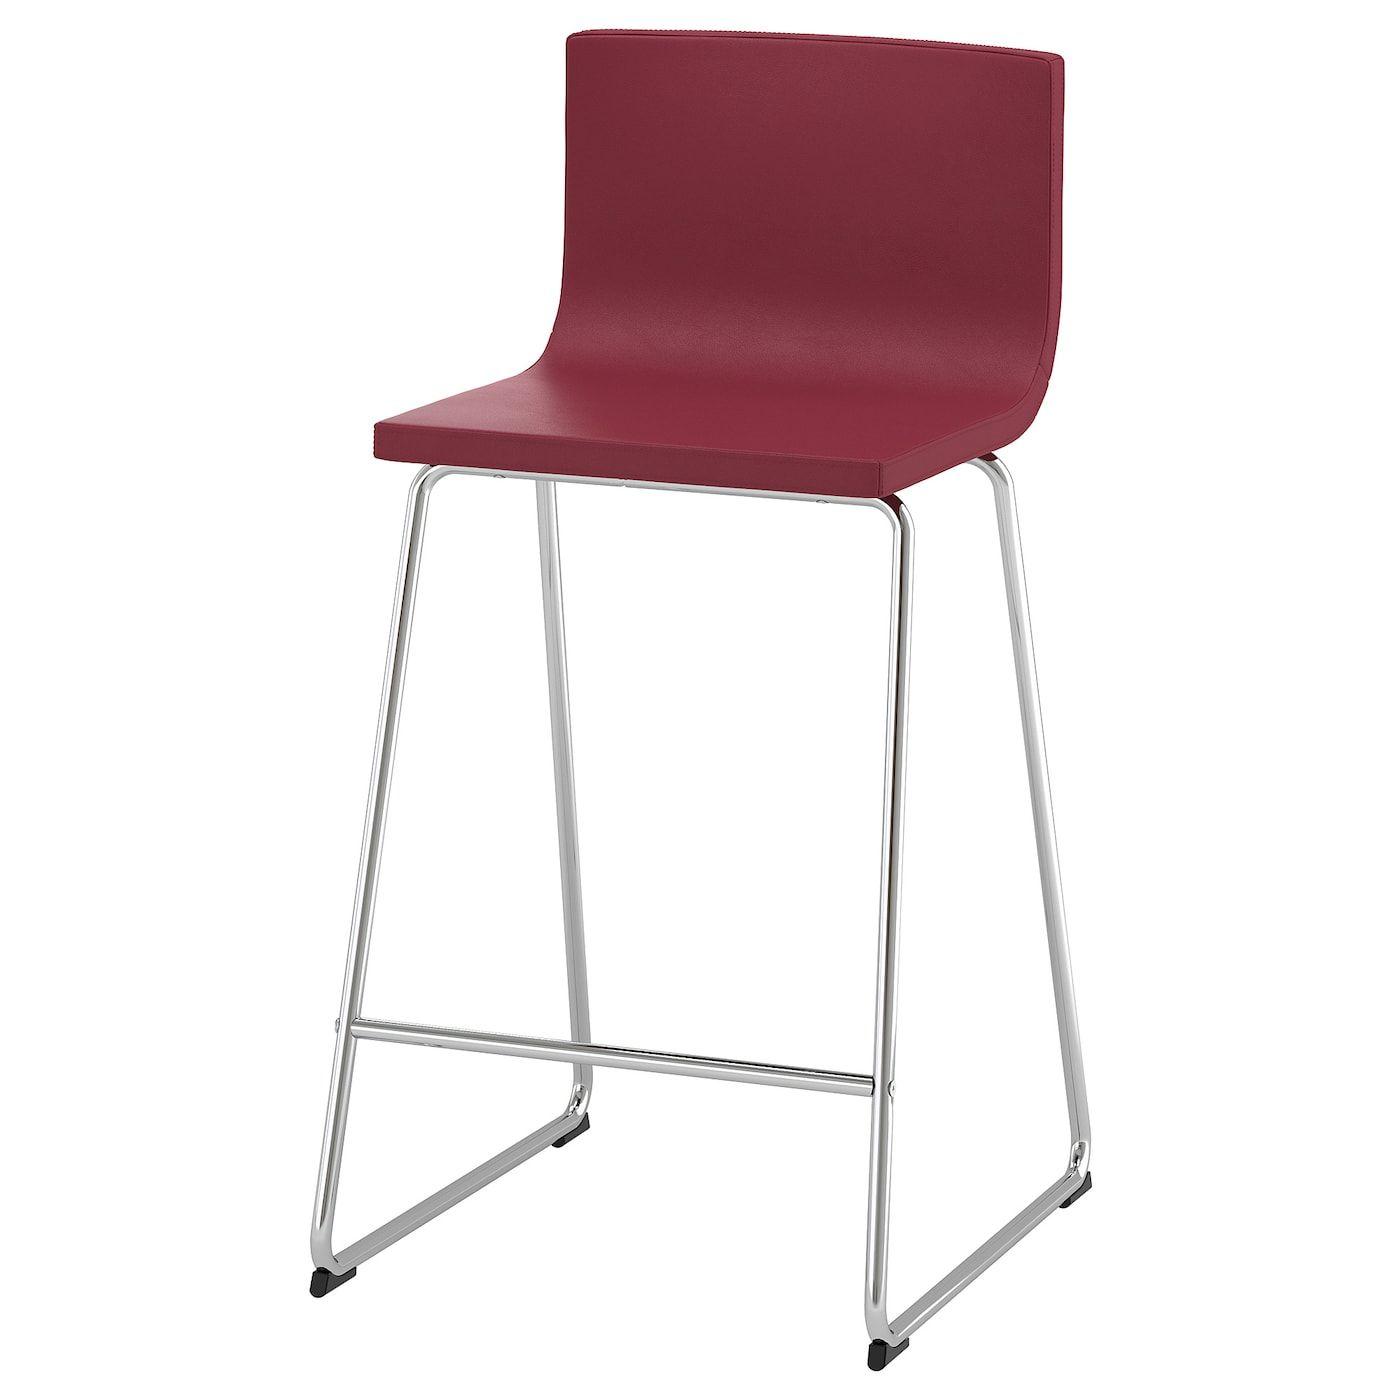 BERNHARD Bar stool with backrest chrome plated, Mjuk dark